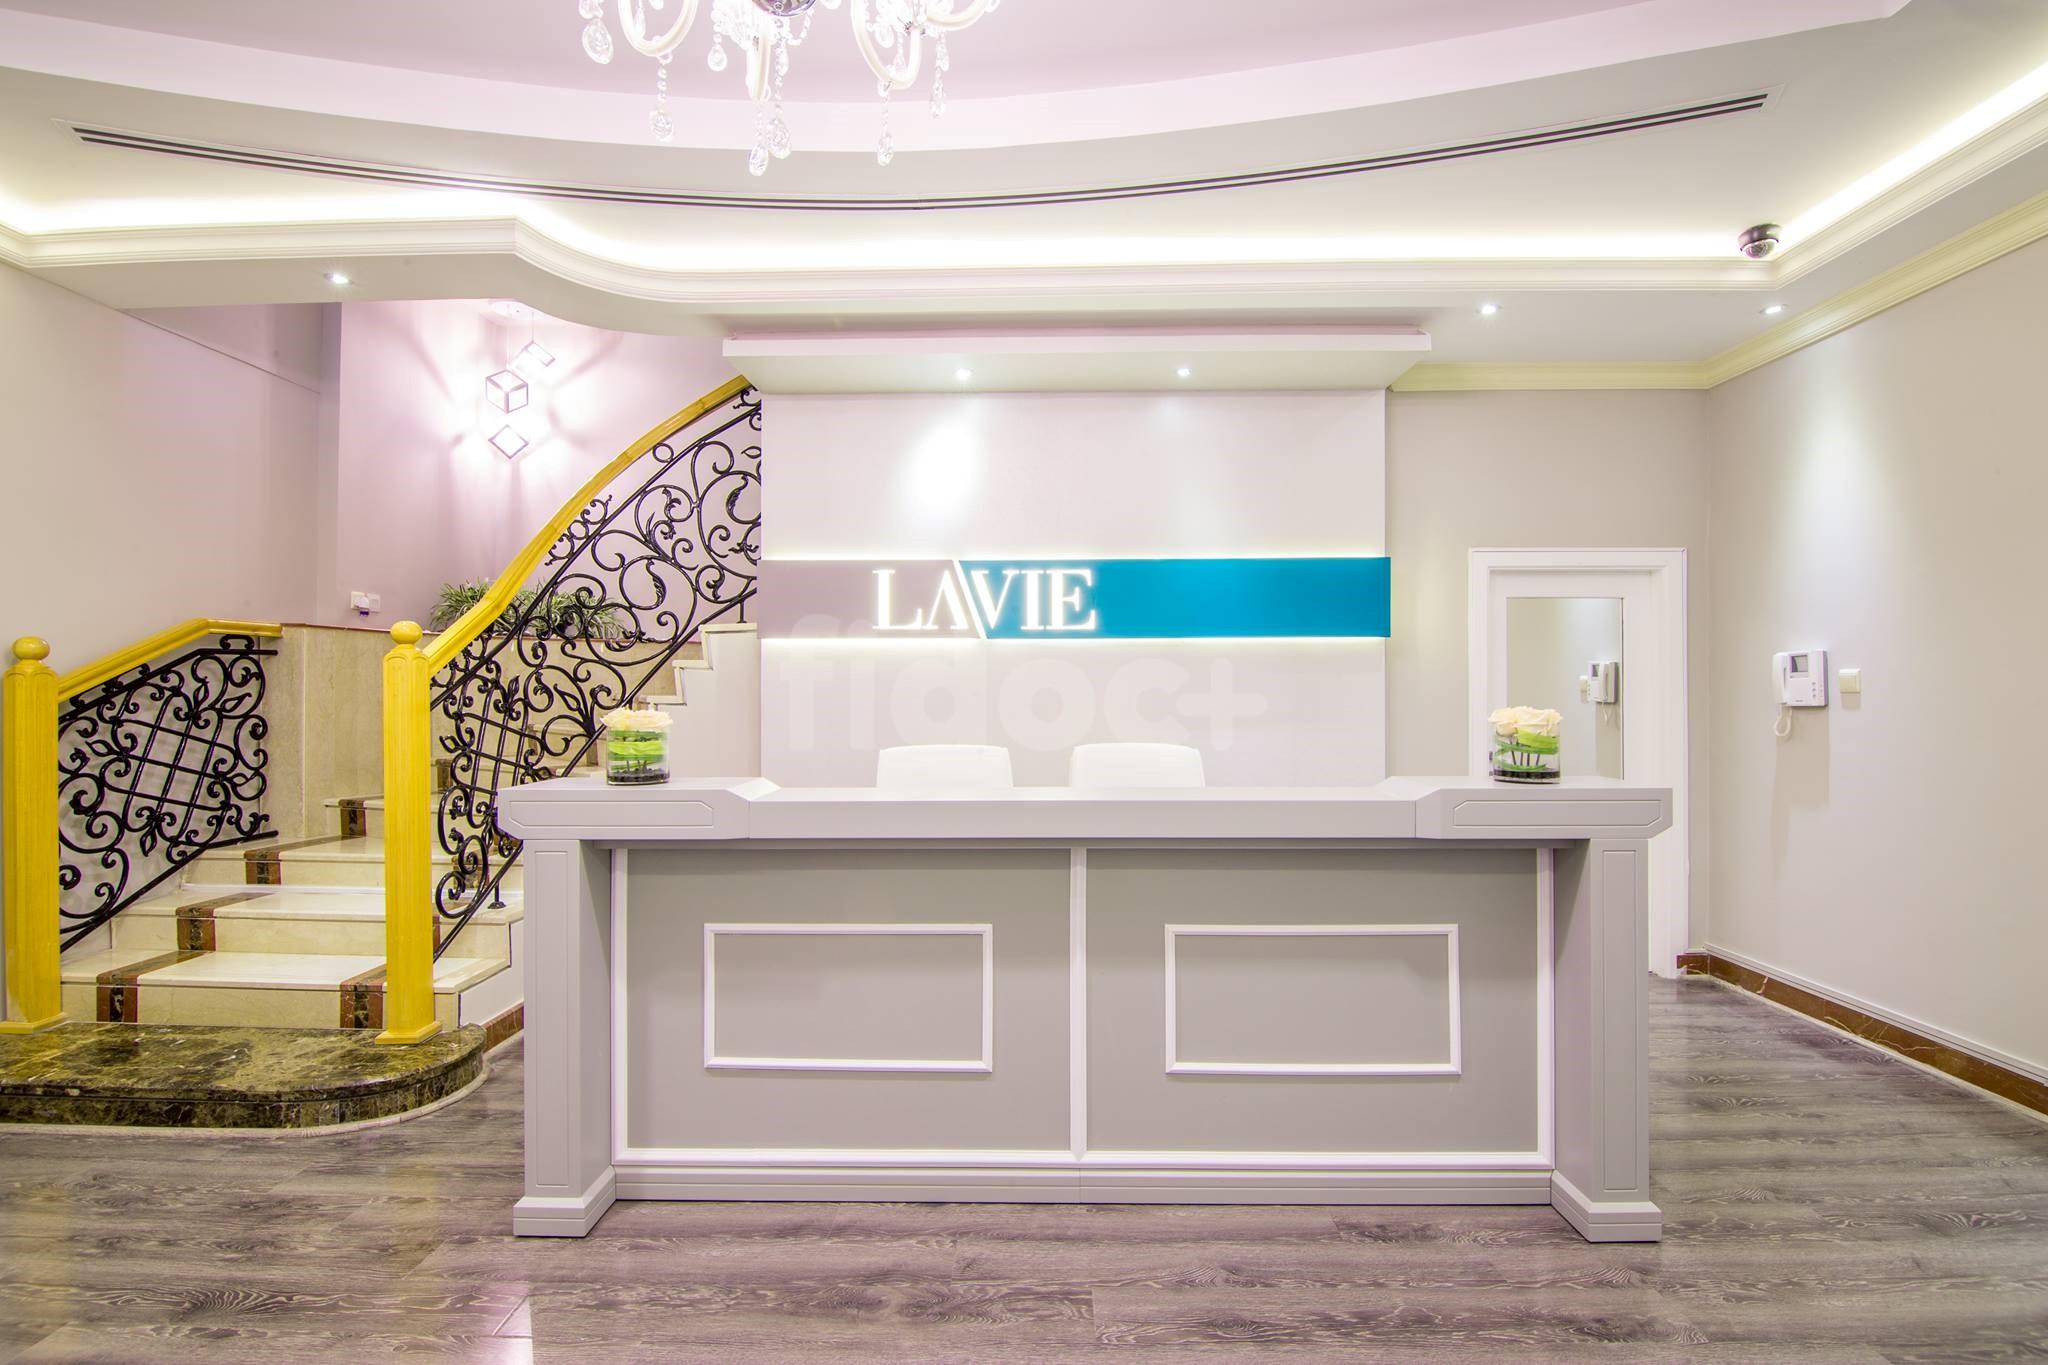 Lavie Clinic, Dubai